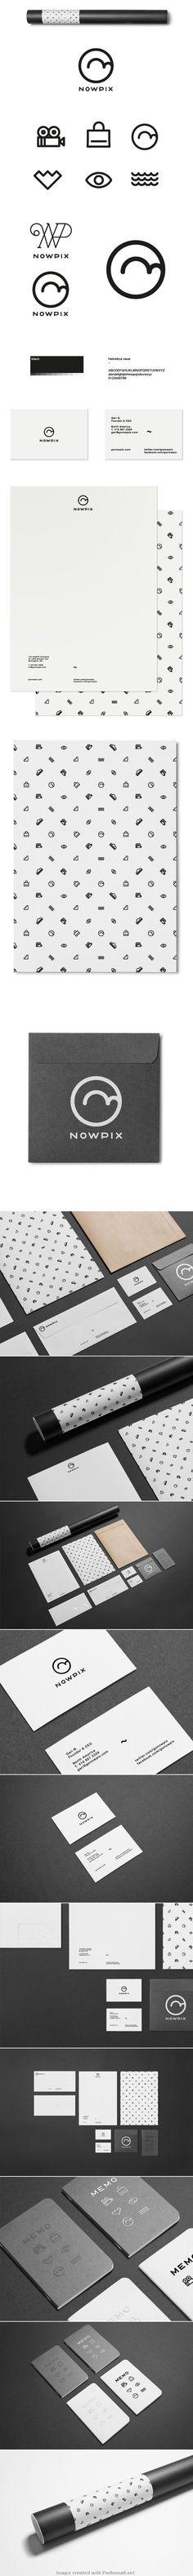 NowPix Branding Identity | Branding | Pinterest